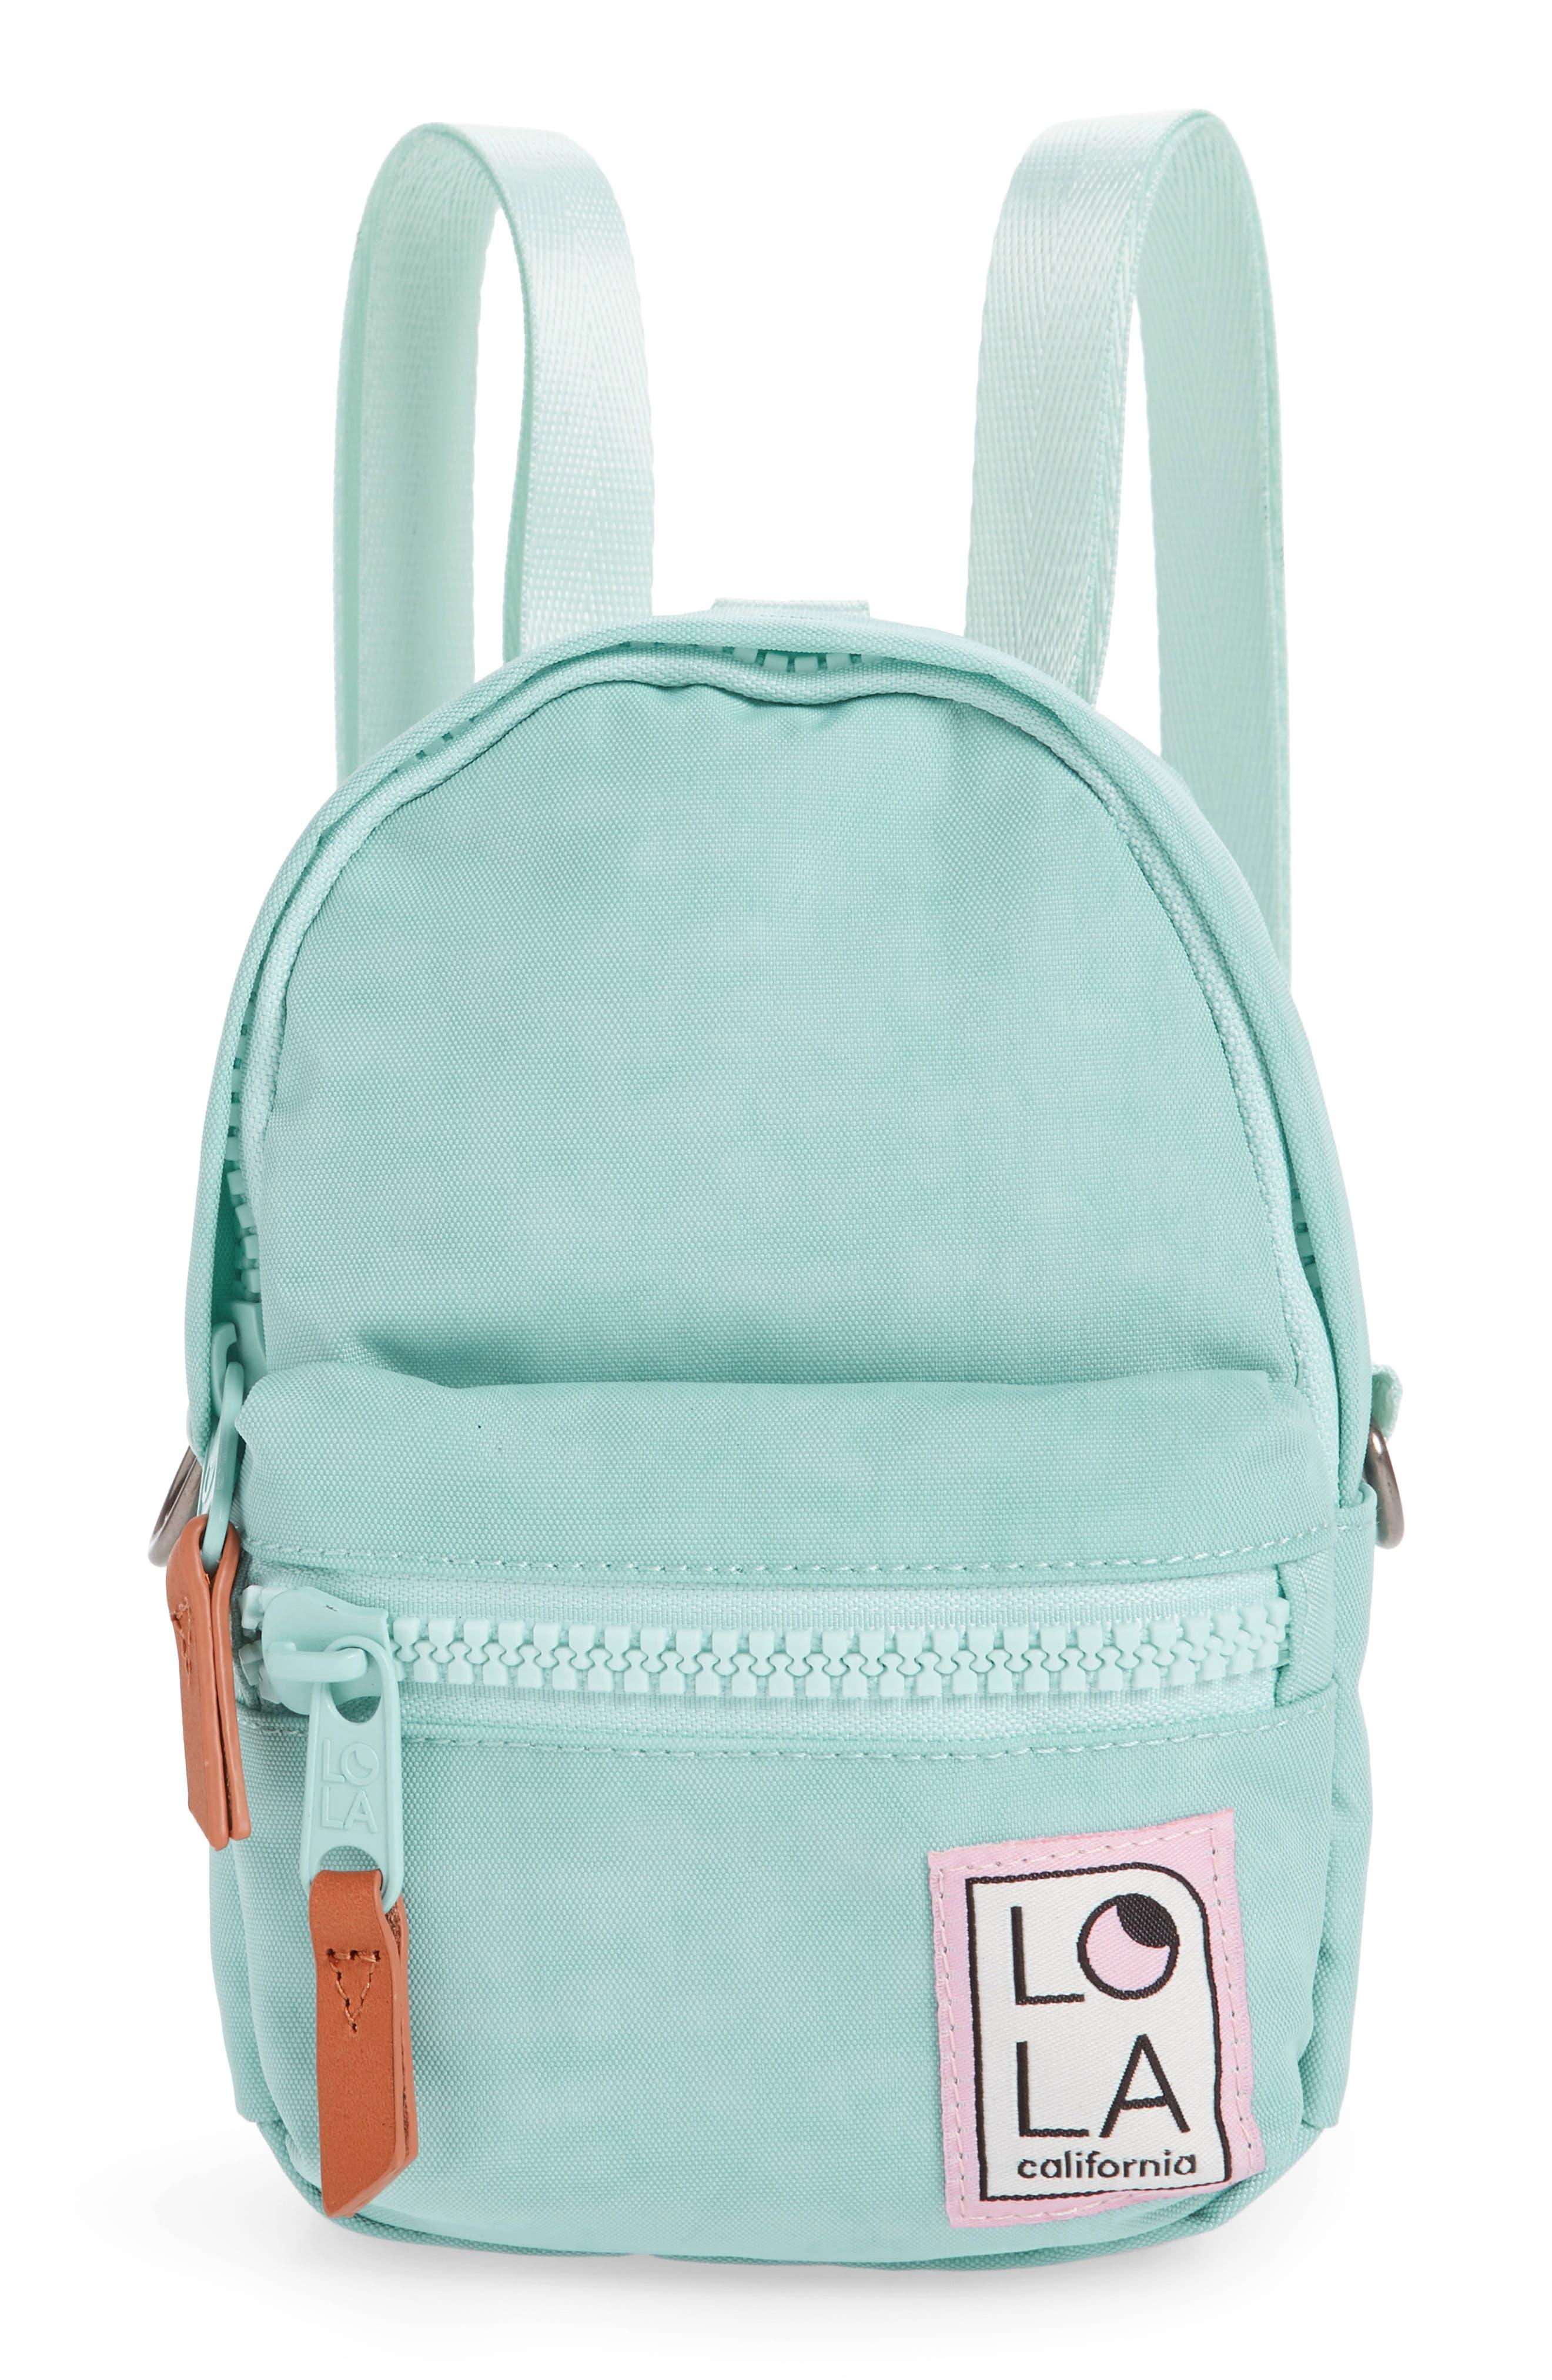 Lola Los Angeles Stargazer Mini Convertible Backpack - Blue